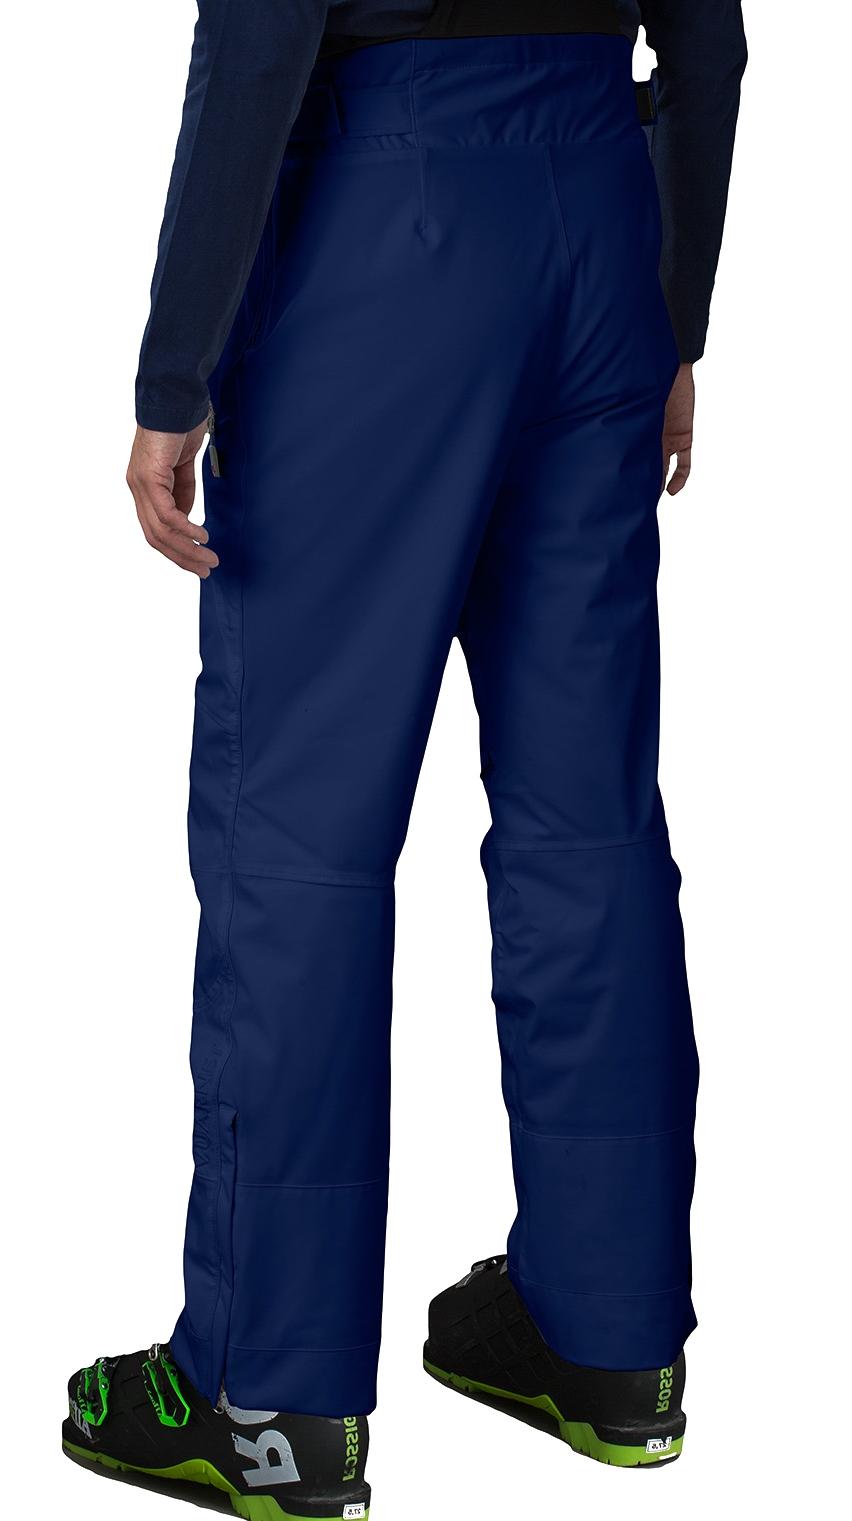 Dark Heilberg Pantalon De Ski Vuarnet Navy mNwOy0v8nP